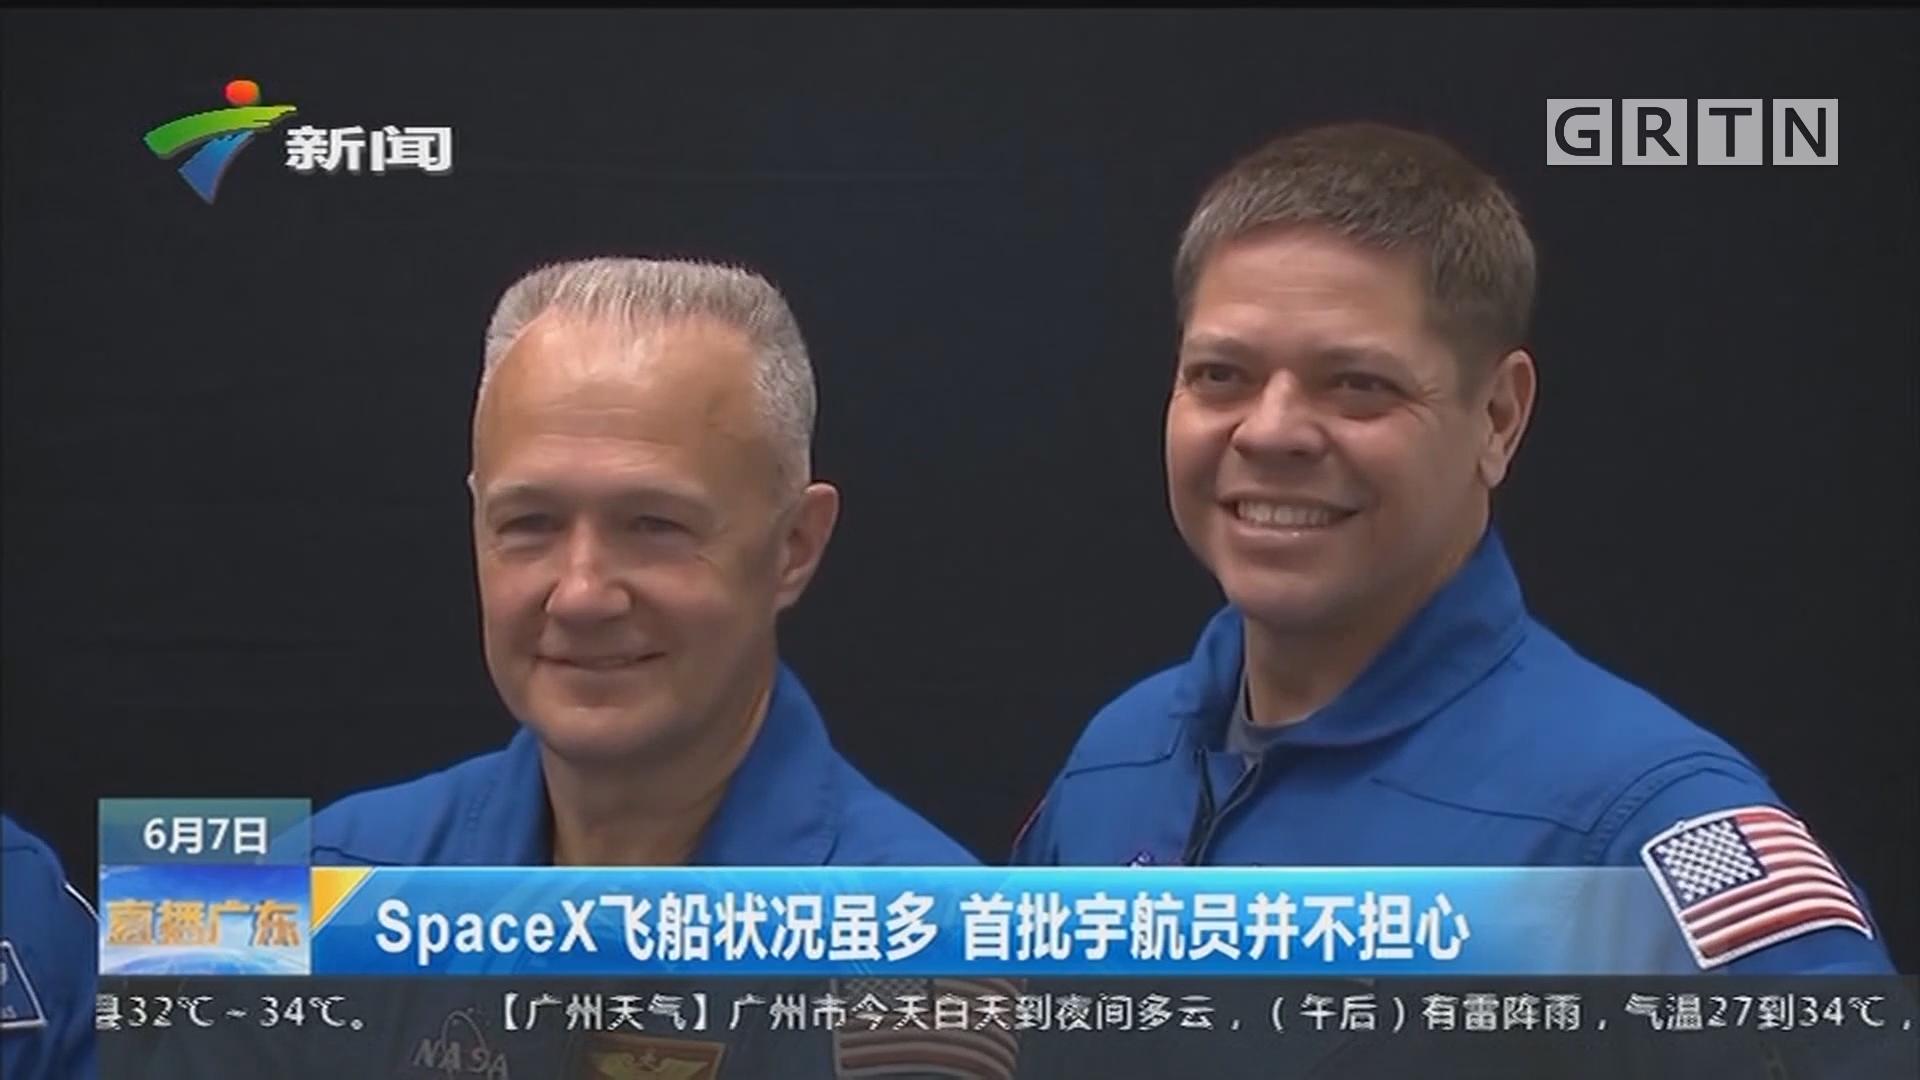 SpaceX飞船状况虽多 首批宇航员并不担心